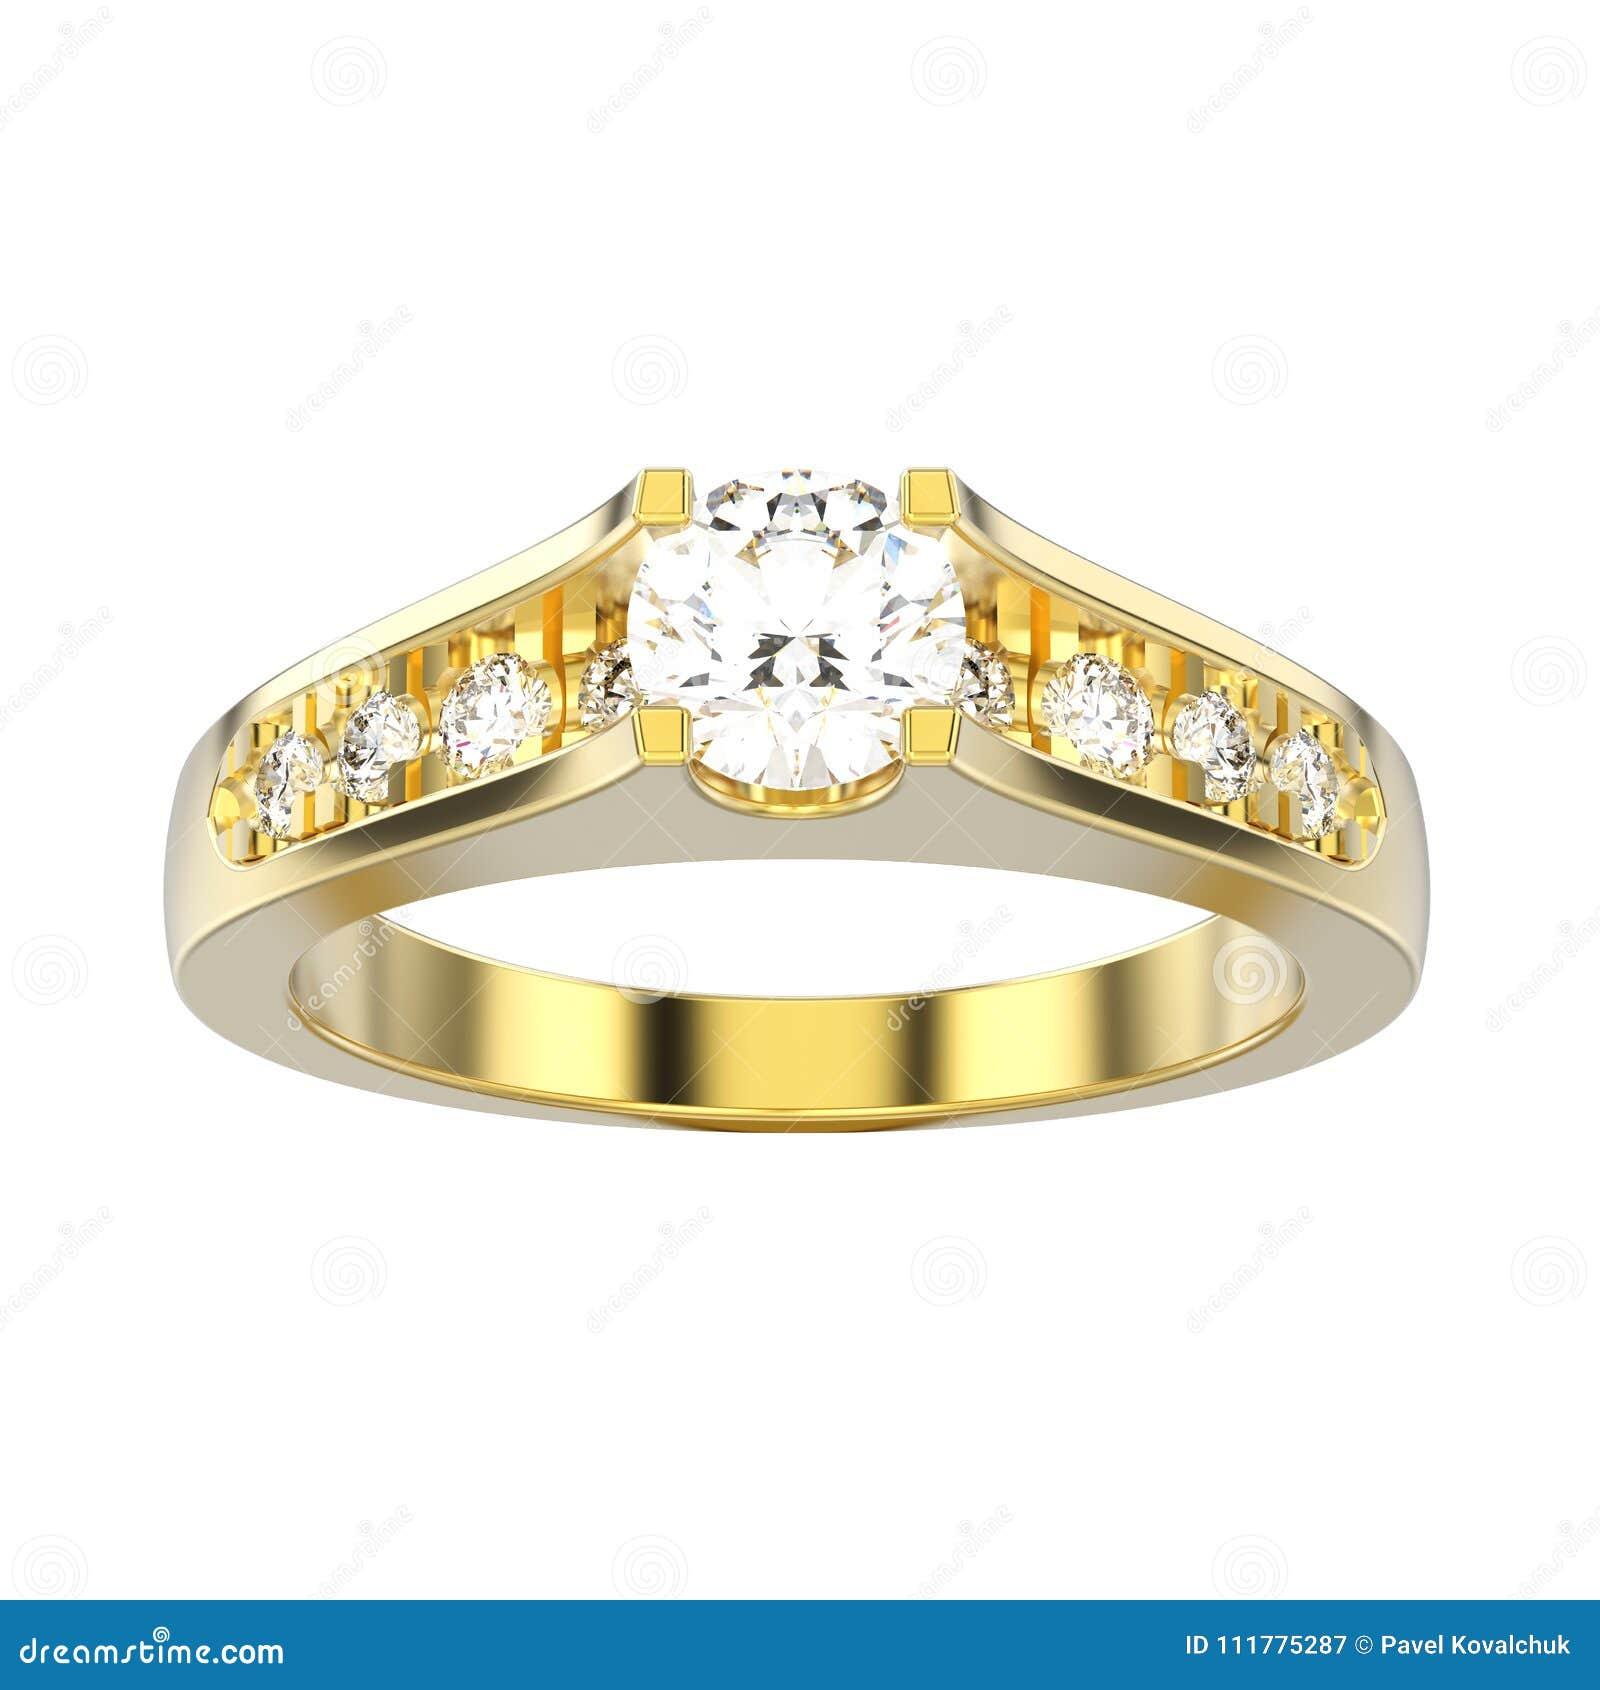 3D illustration isolated yellow gold decorative engagement wedding diamond ring